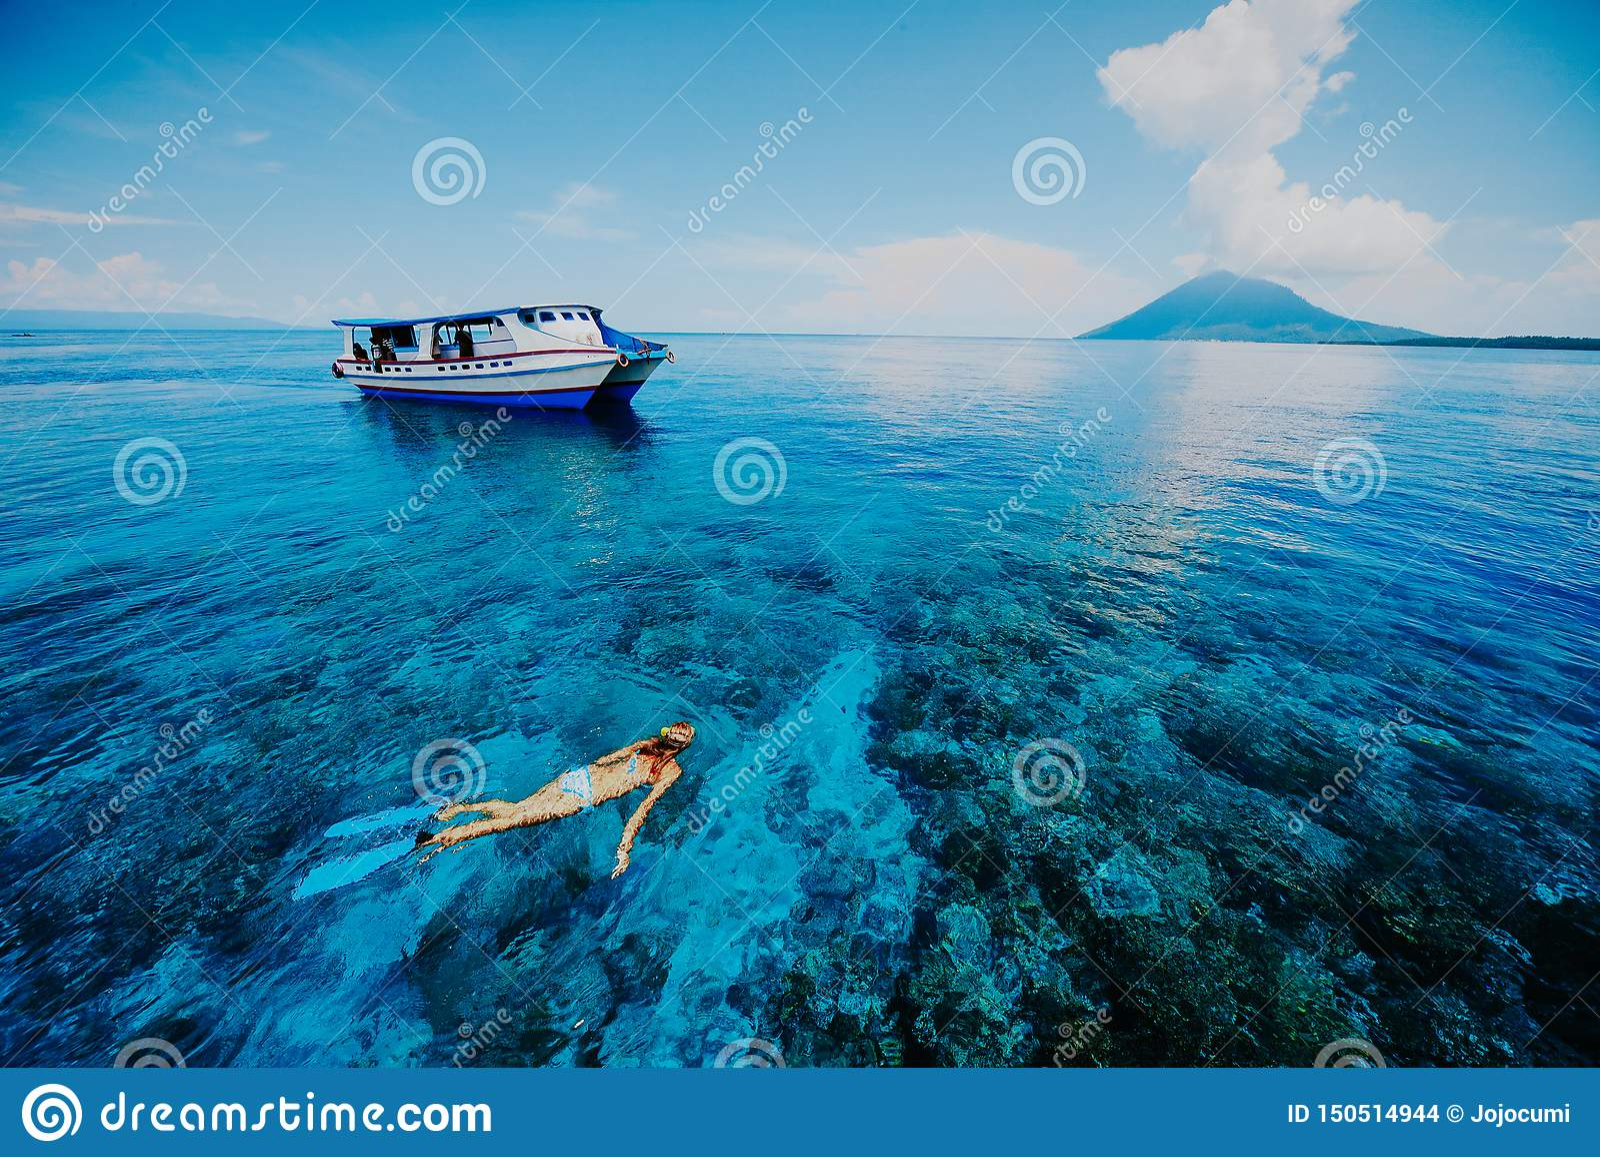 Snorkeling w Błękitnym morzu blisko Krakatau góry